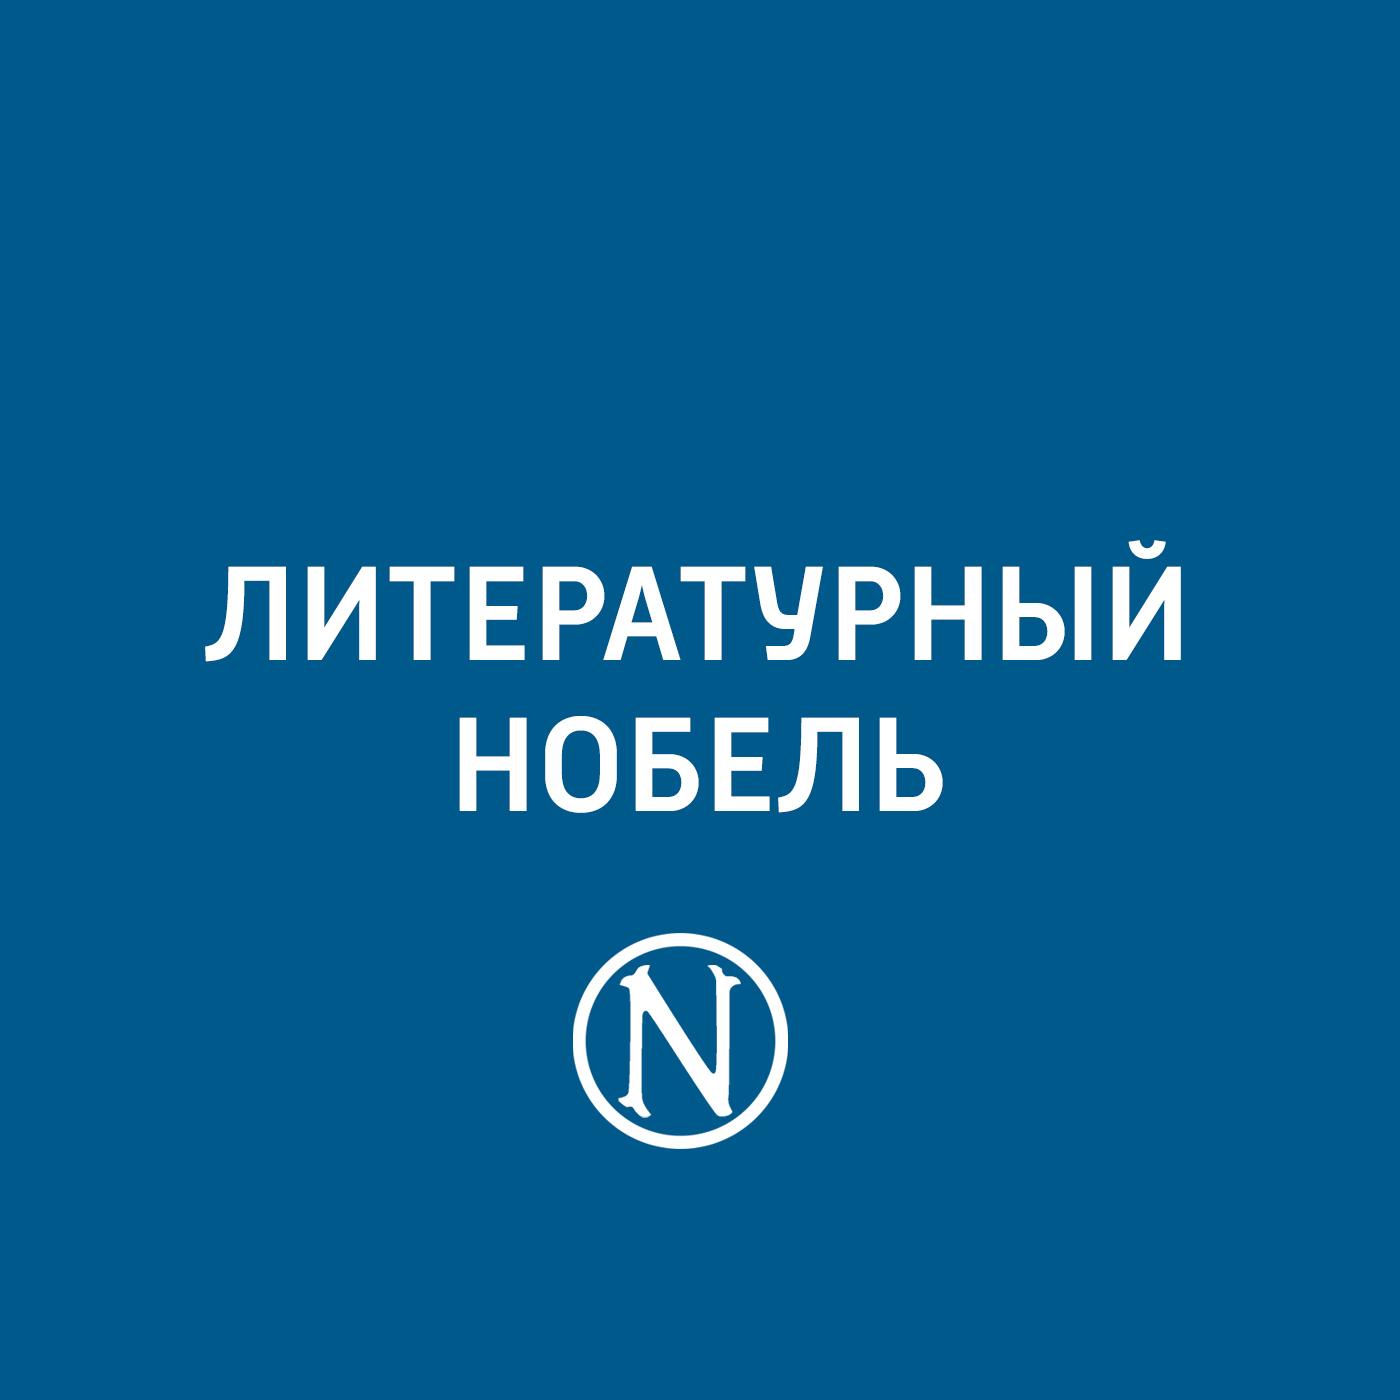 цена на Евгений Стаховский Бернард Шоу